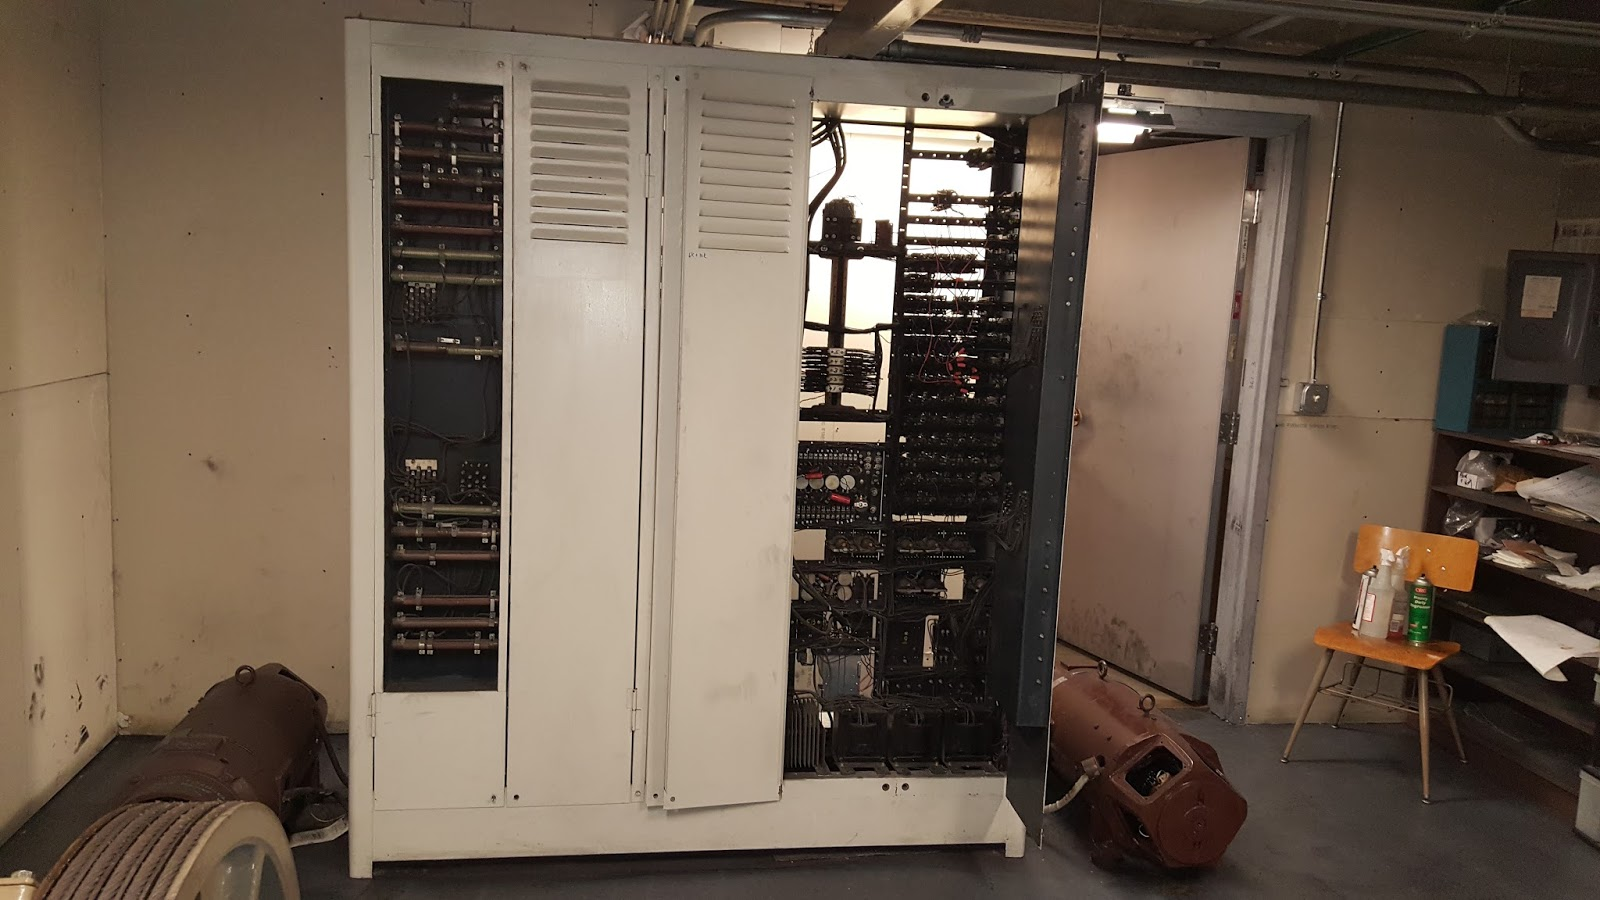 hydraulic elevator wiring diagram mce controller automotive block chicago elevator maintenance colley elevator april 2017 rh [ 1600 x 900 Pixel ]